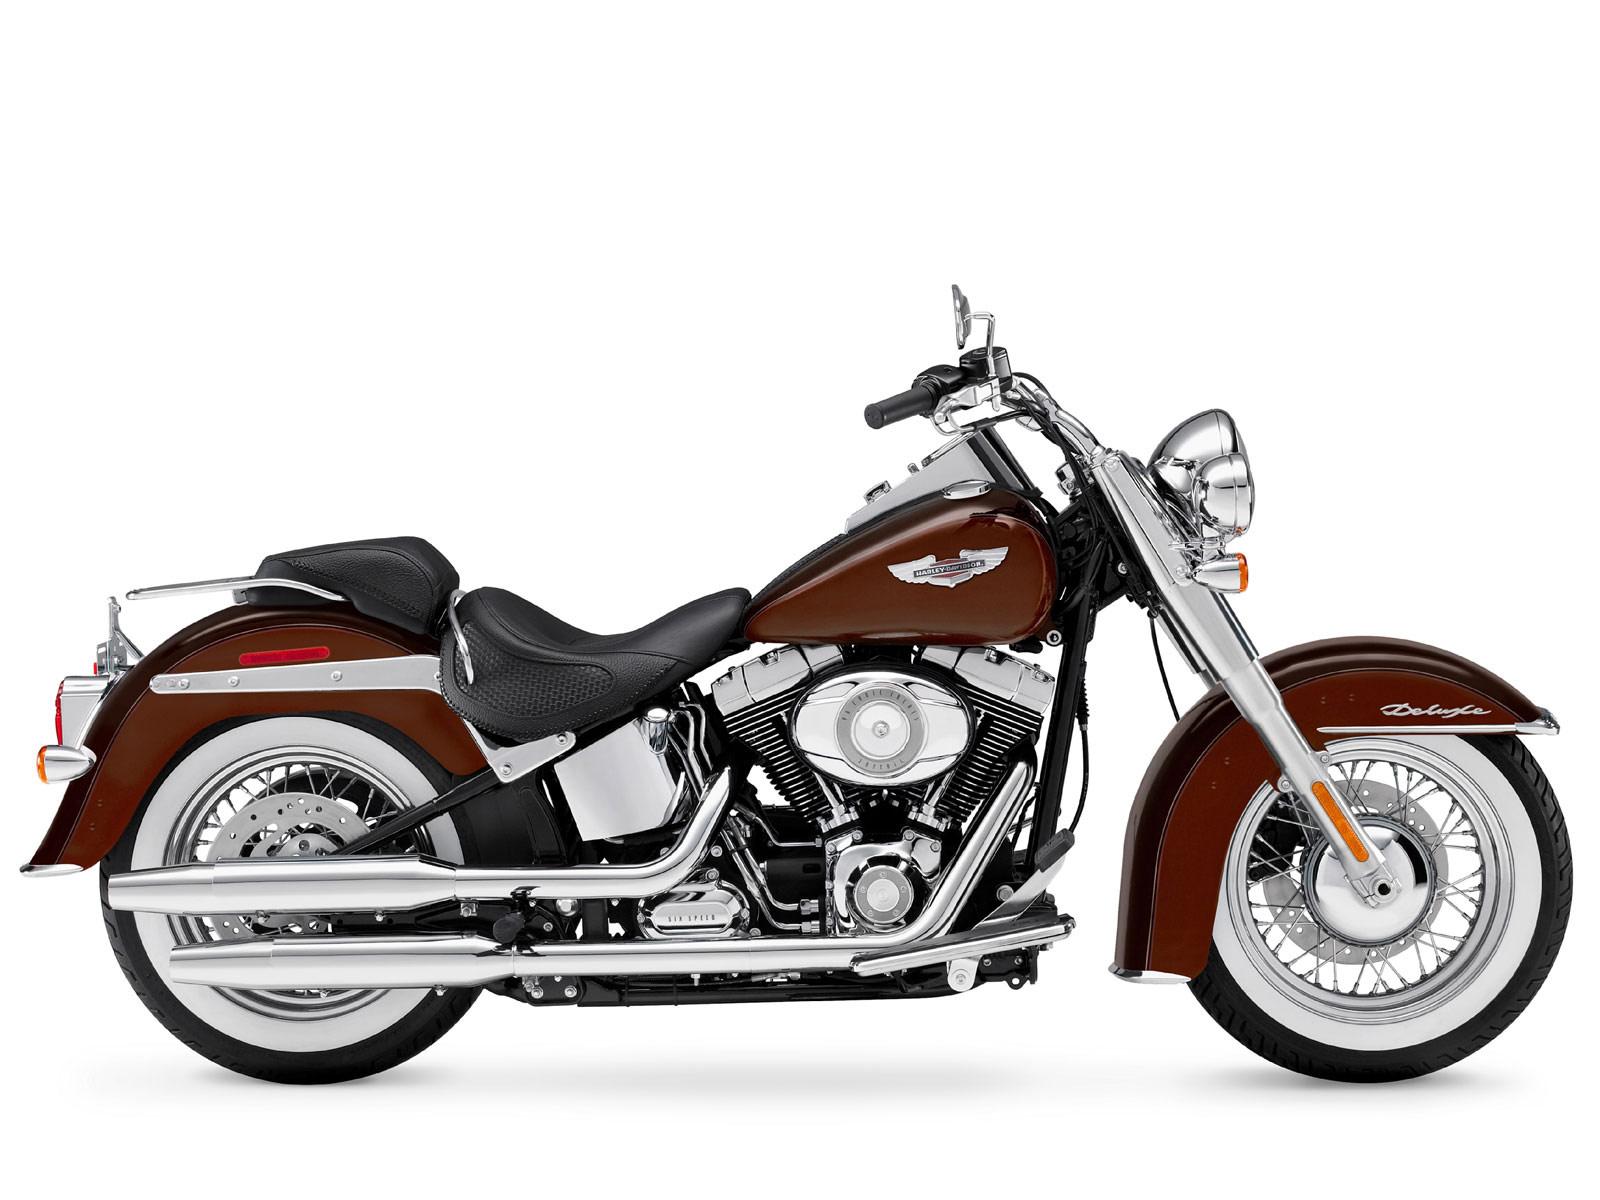 Harley Davidson Softail: 2011 Harley Davidson FLSTN Softail Deluxe Accident Lawyers